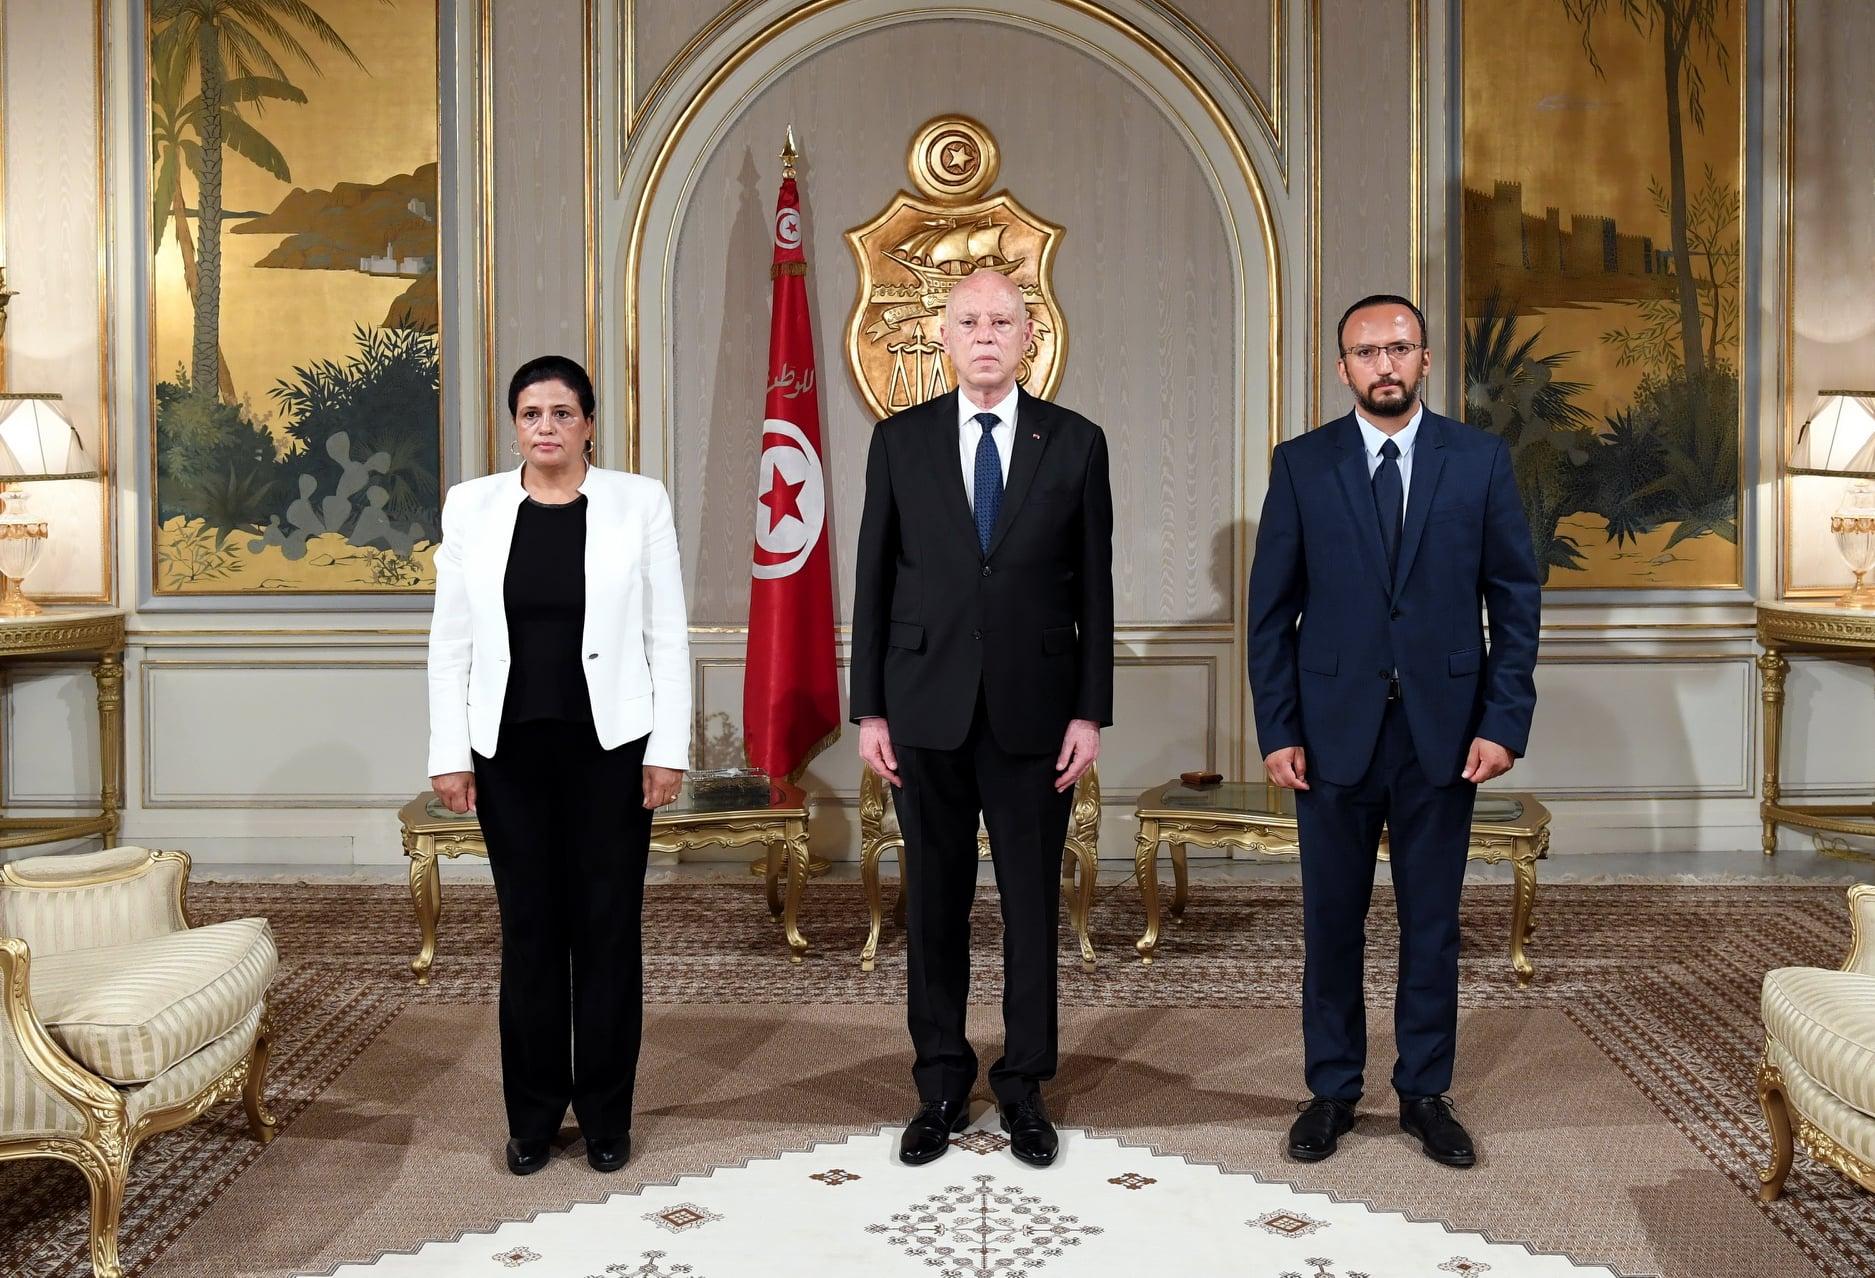 Tunisie [PHOTOS]: Cérémonie de prestation de serment de Sihem Boughdiri et Nizar Ben Néji